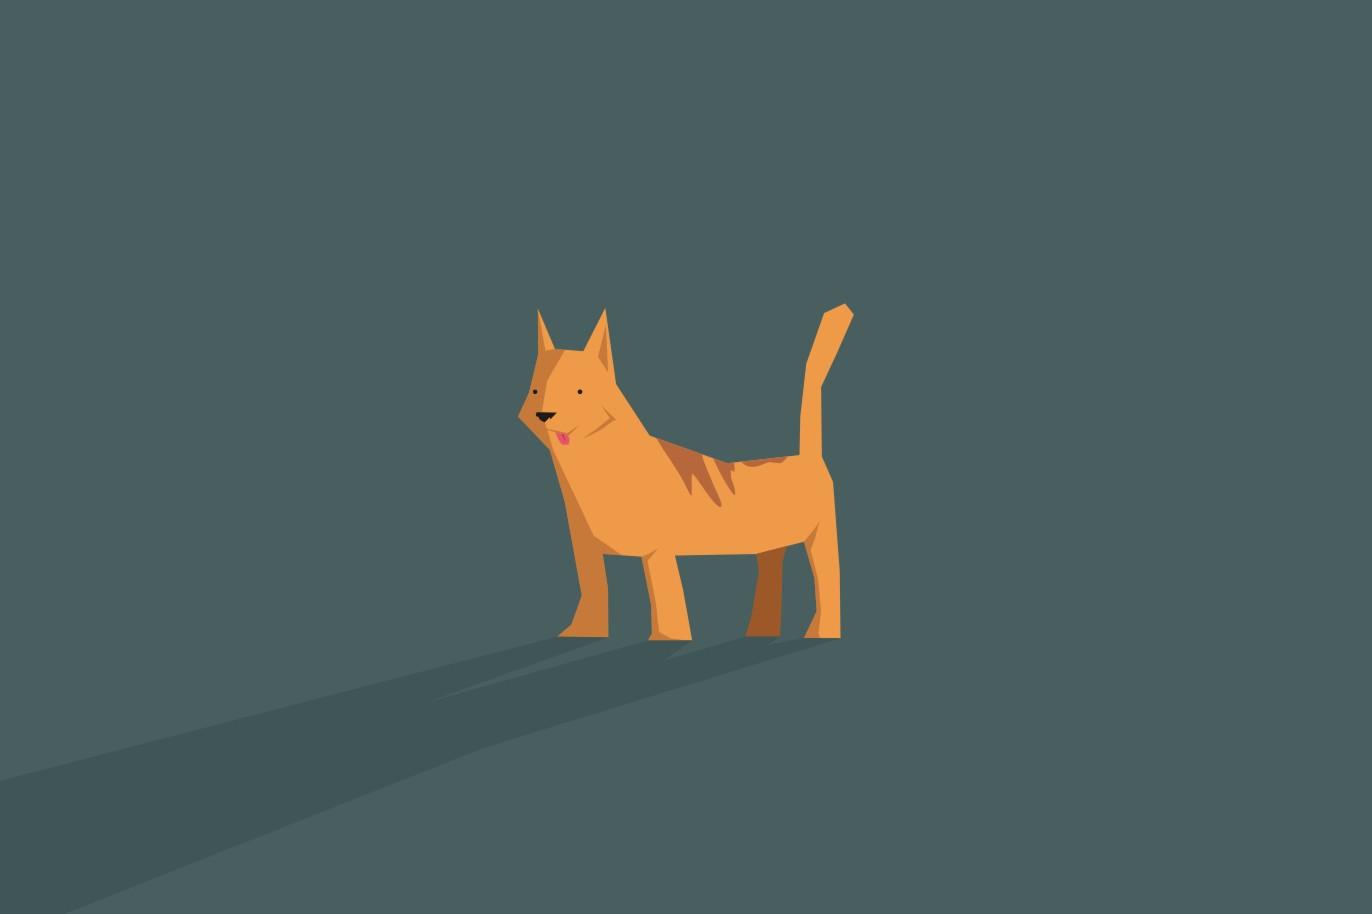 Ini alasan kucing menoleh saat dipanggil 'pus'